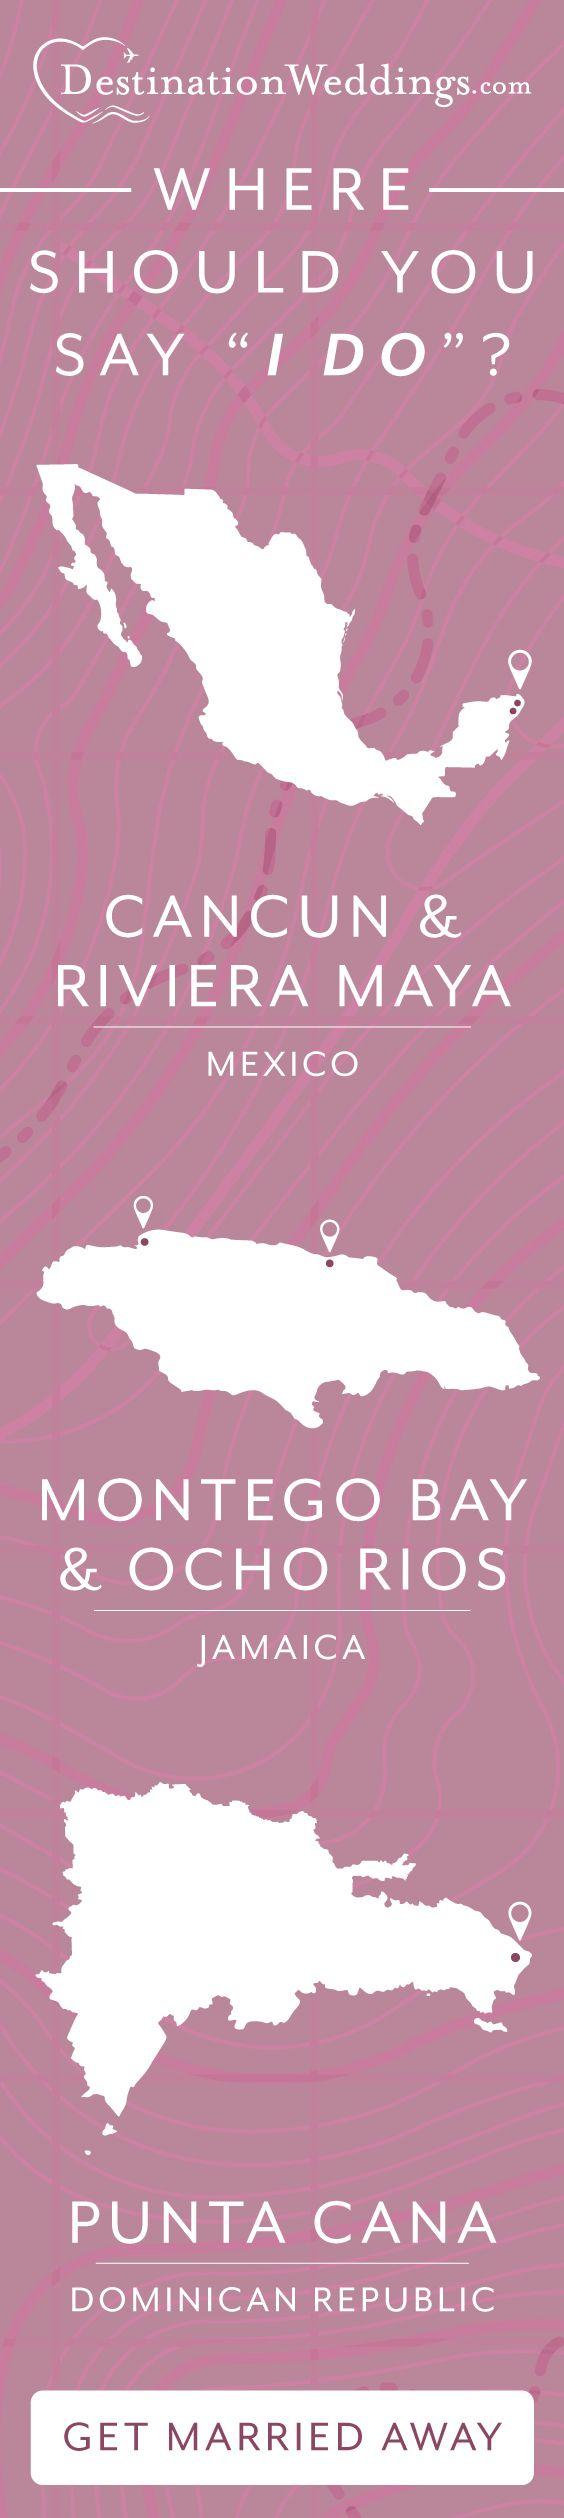 Destination wedding locales   destination wedding trends   wedding trends   Cancun destination weddings   Riviera Maya destination weddings   Mexico destination weddings